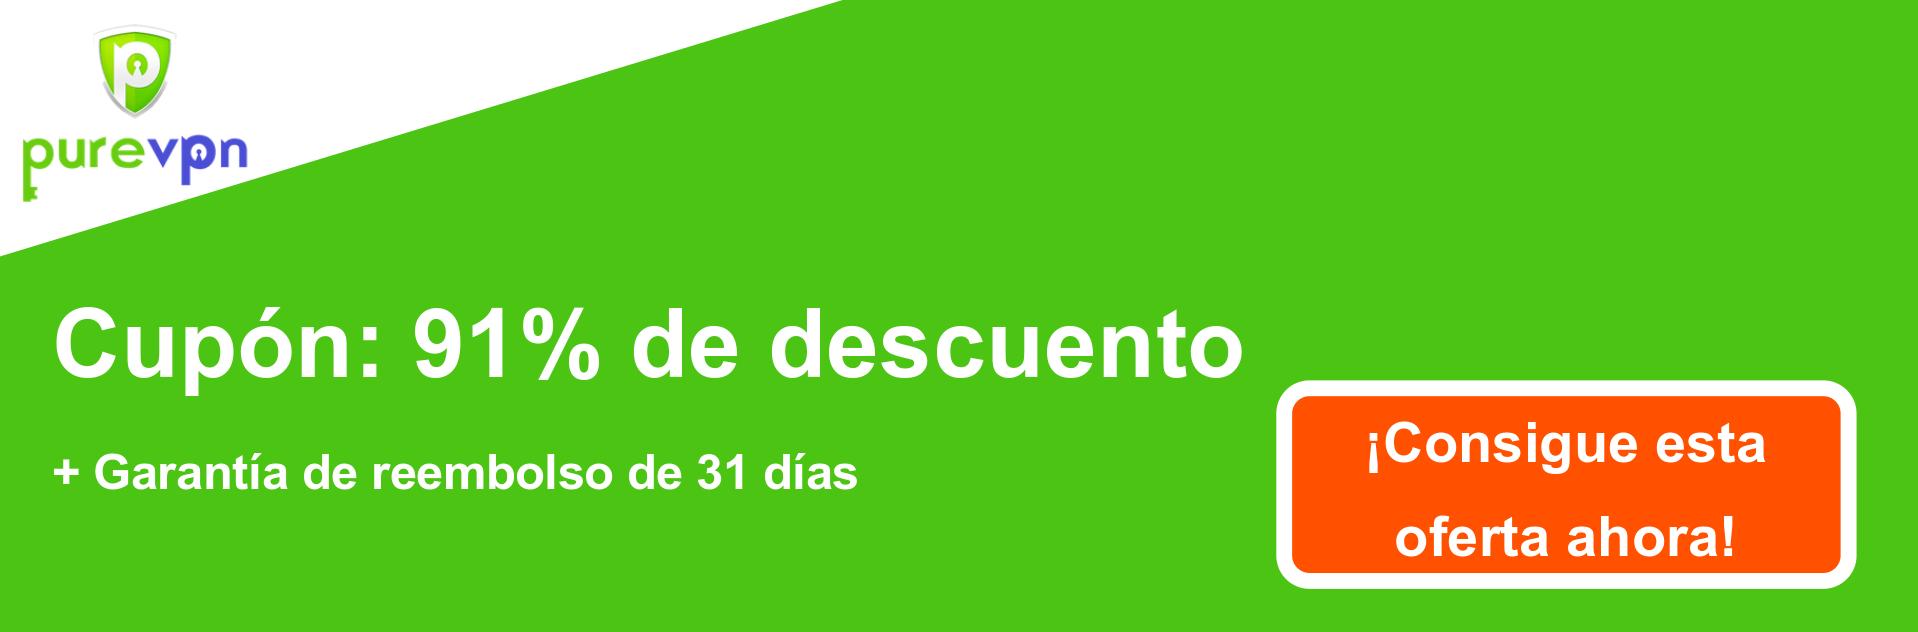 Banner de cupón PureVPN: 91% de descuento